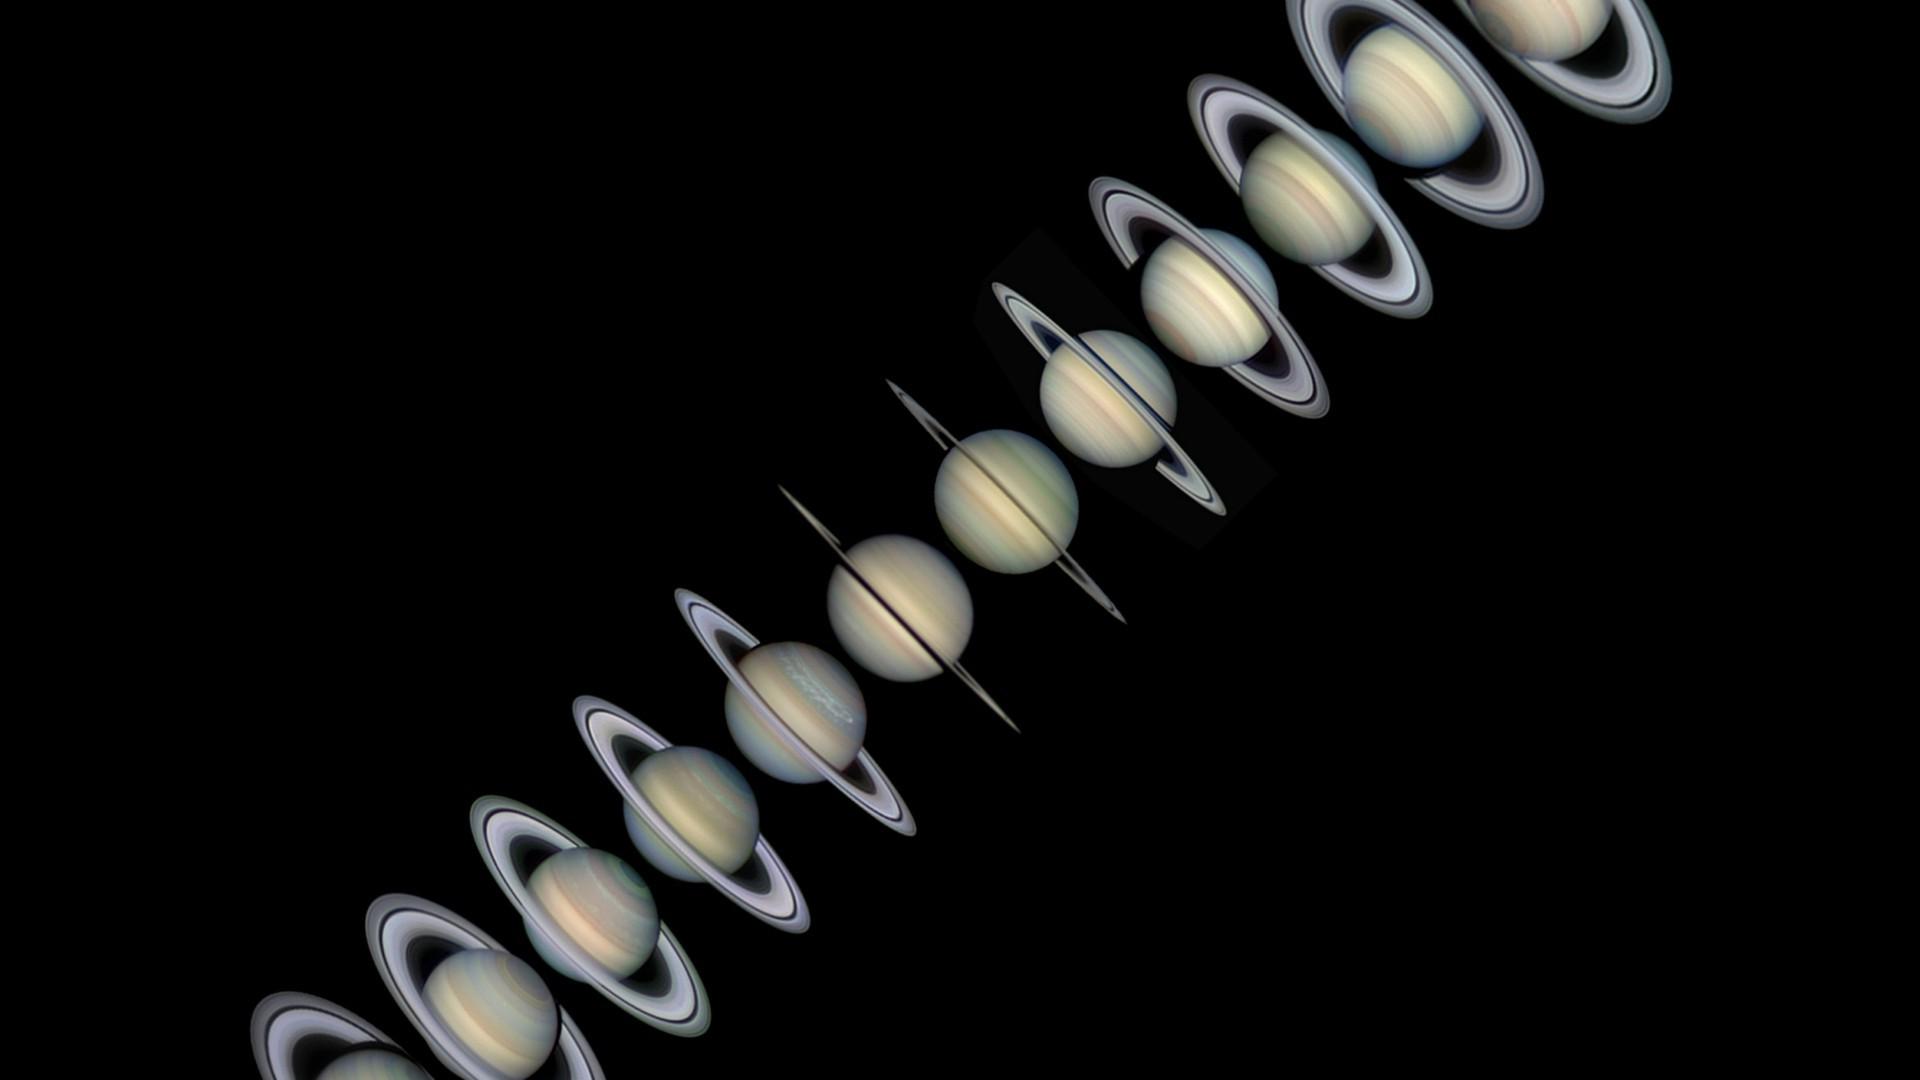 Wallpaper 1920x1080 Px Nasa Saturn Space 1920x1080